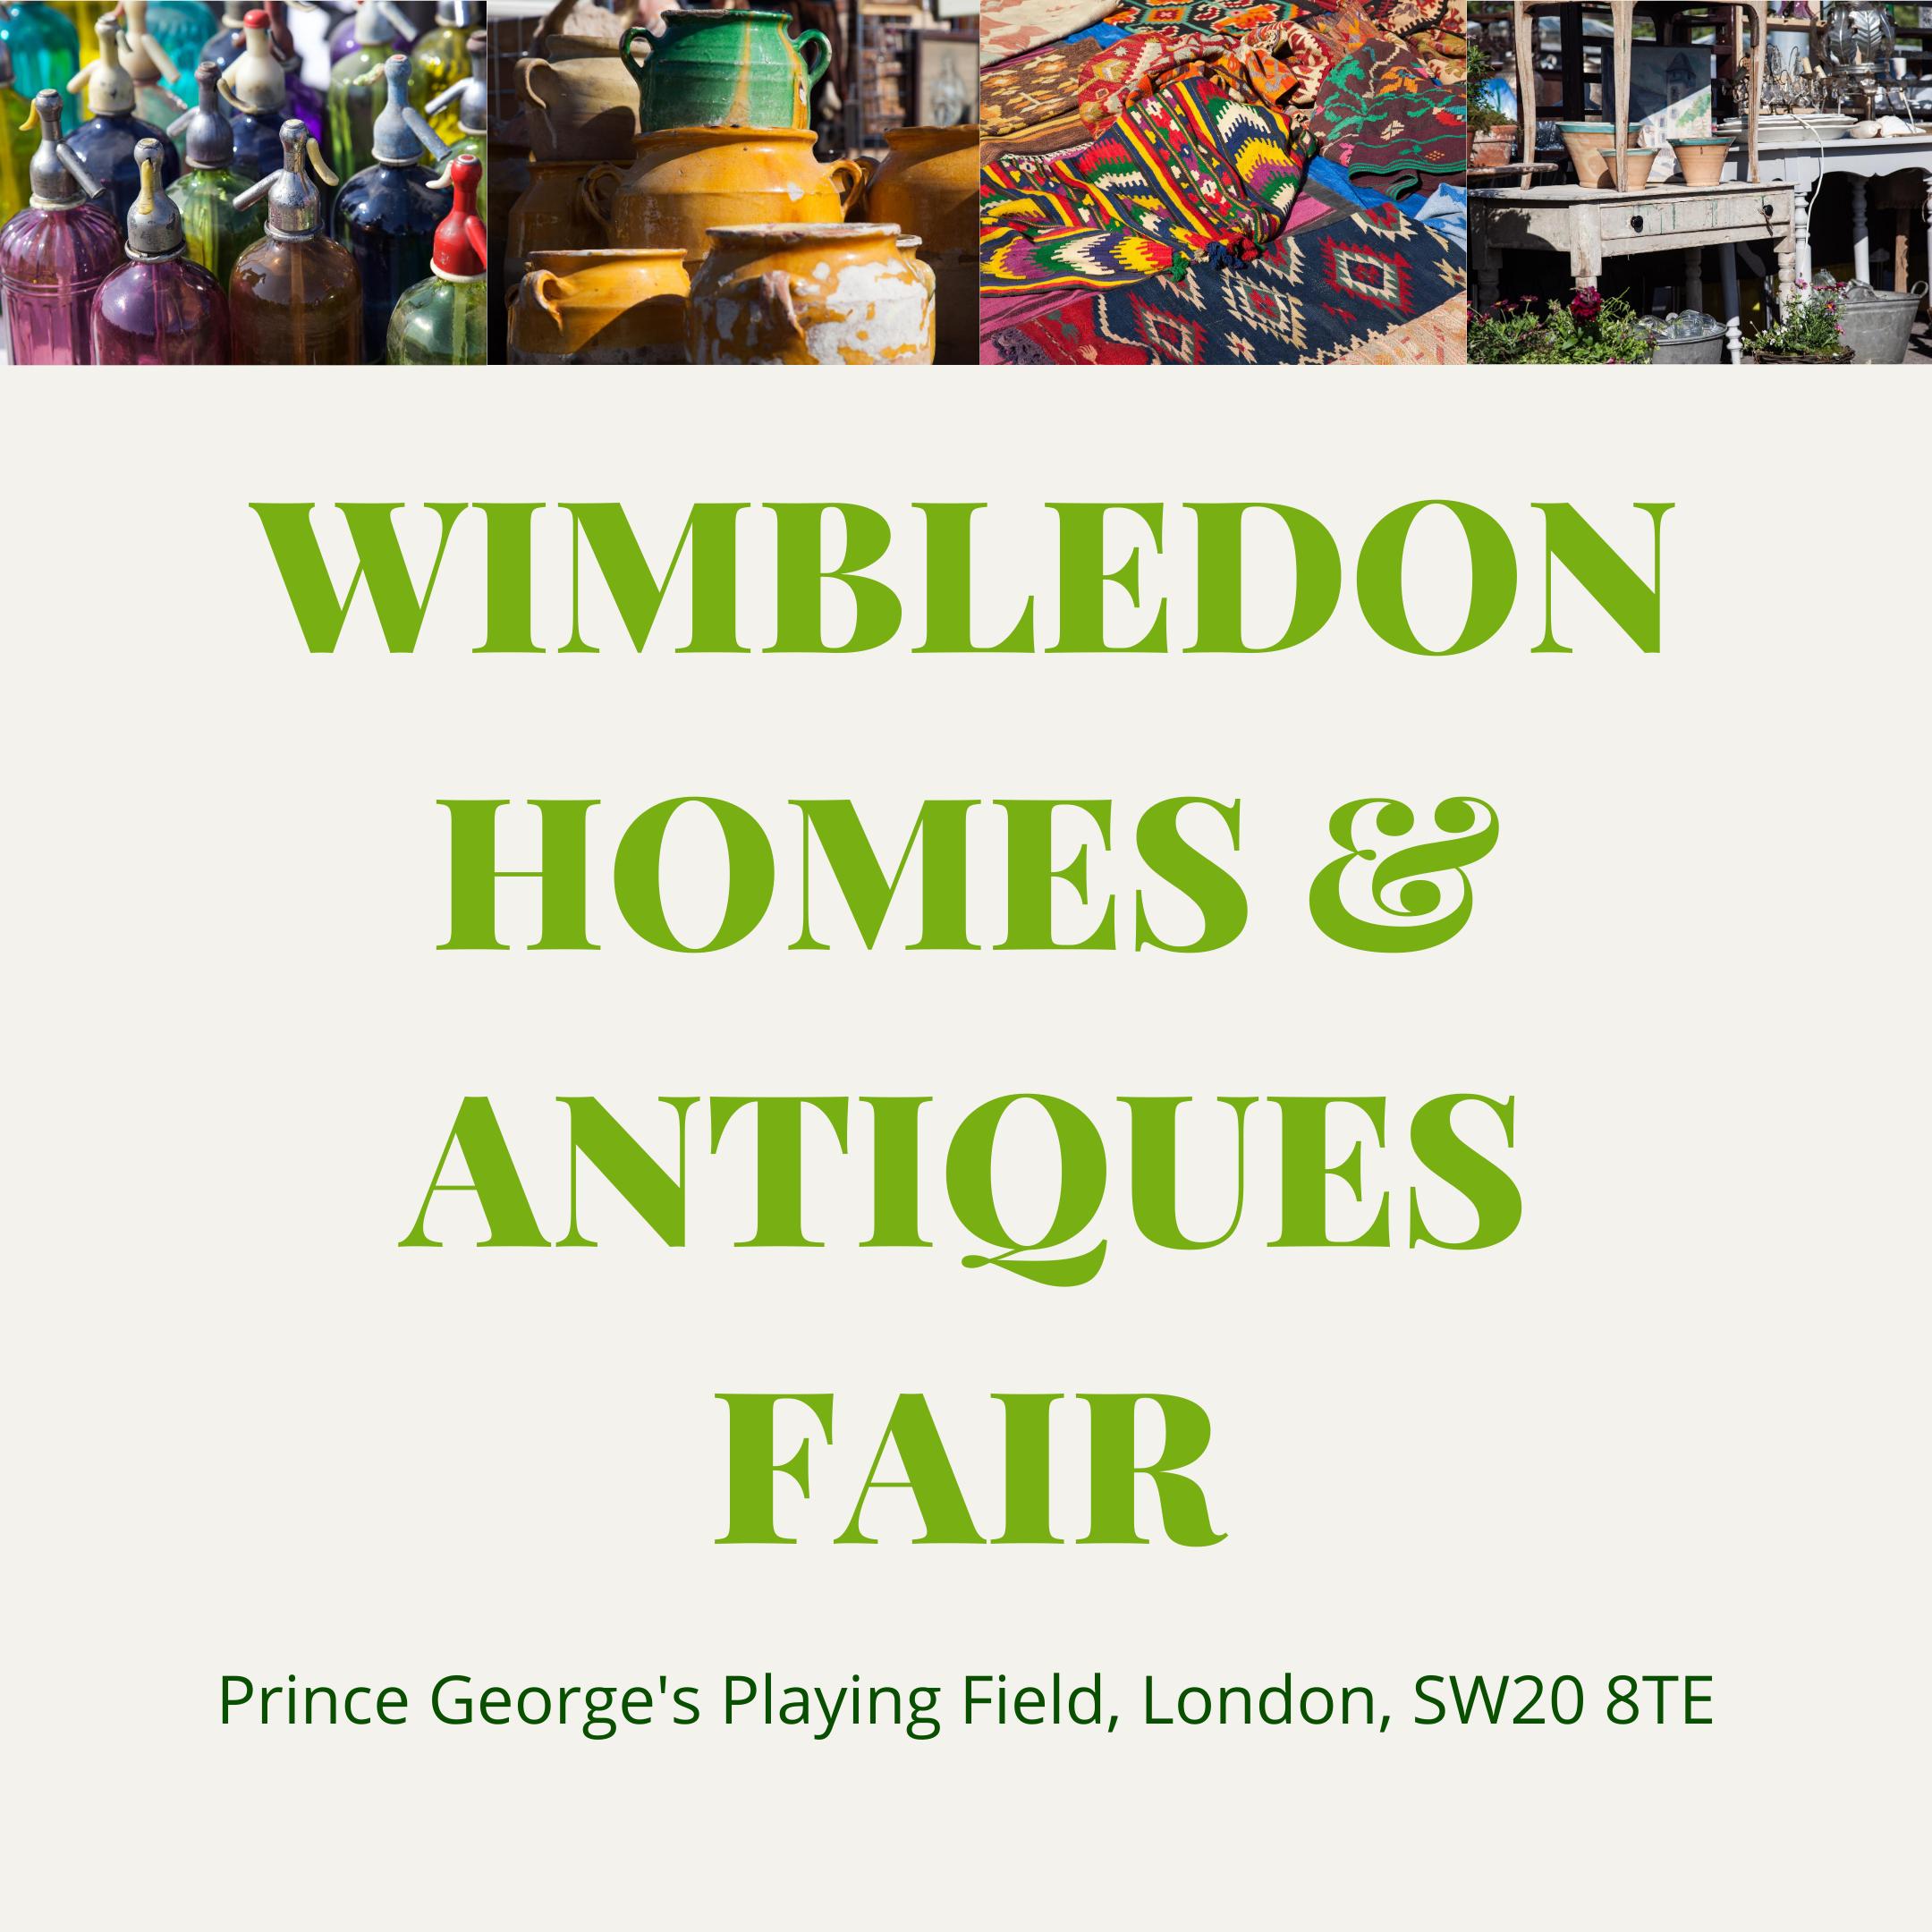 Wimbledon Homes & Antiques Fair